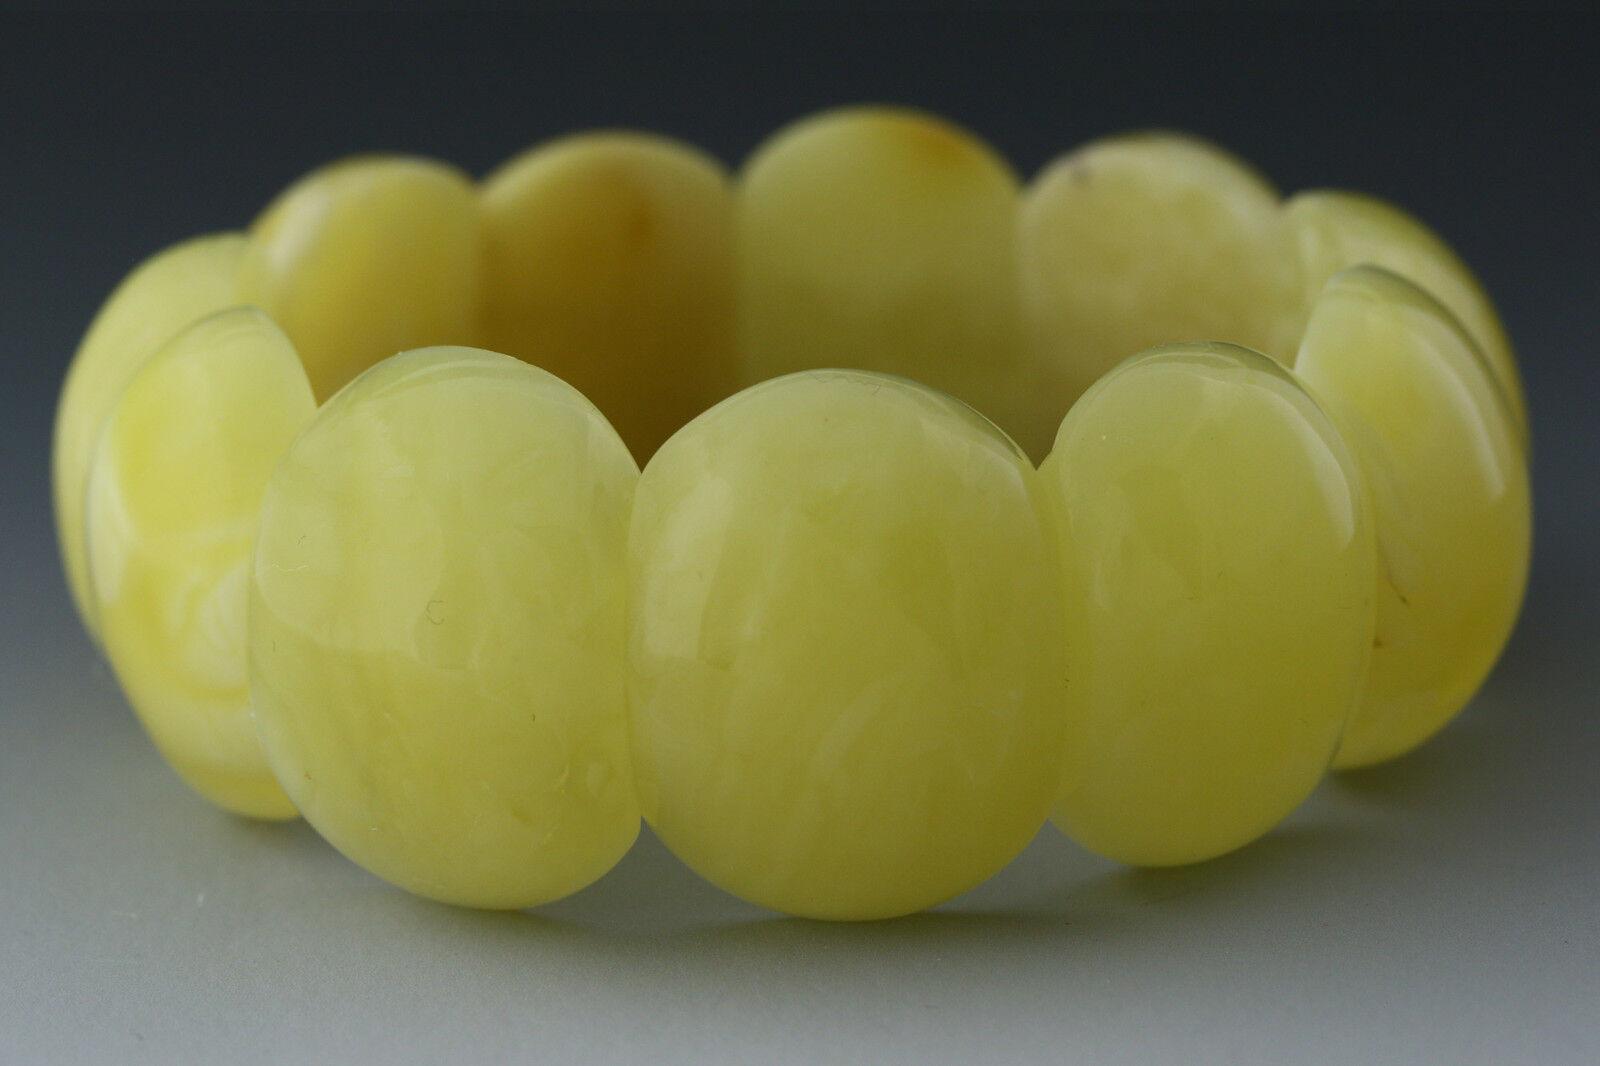 Genuine BALTIC AMBER Egg Yolk Pieces Stretch Unisex Bracelet 38.1g 190124-1